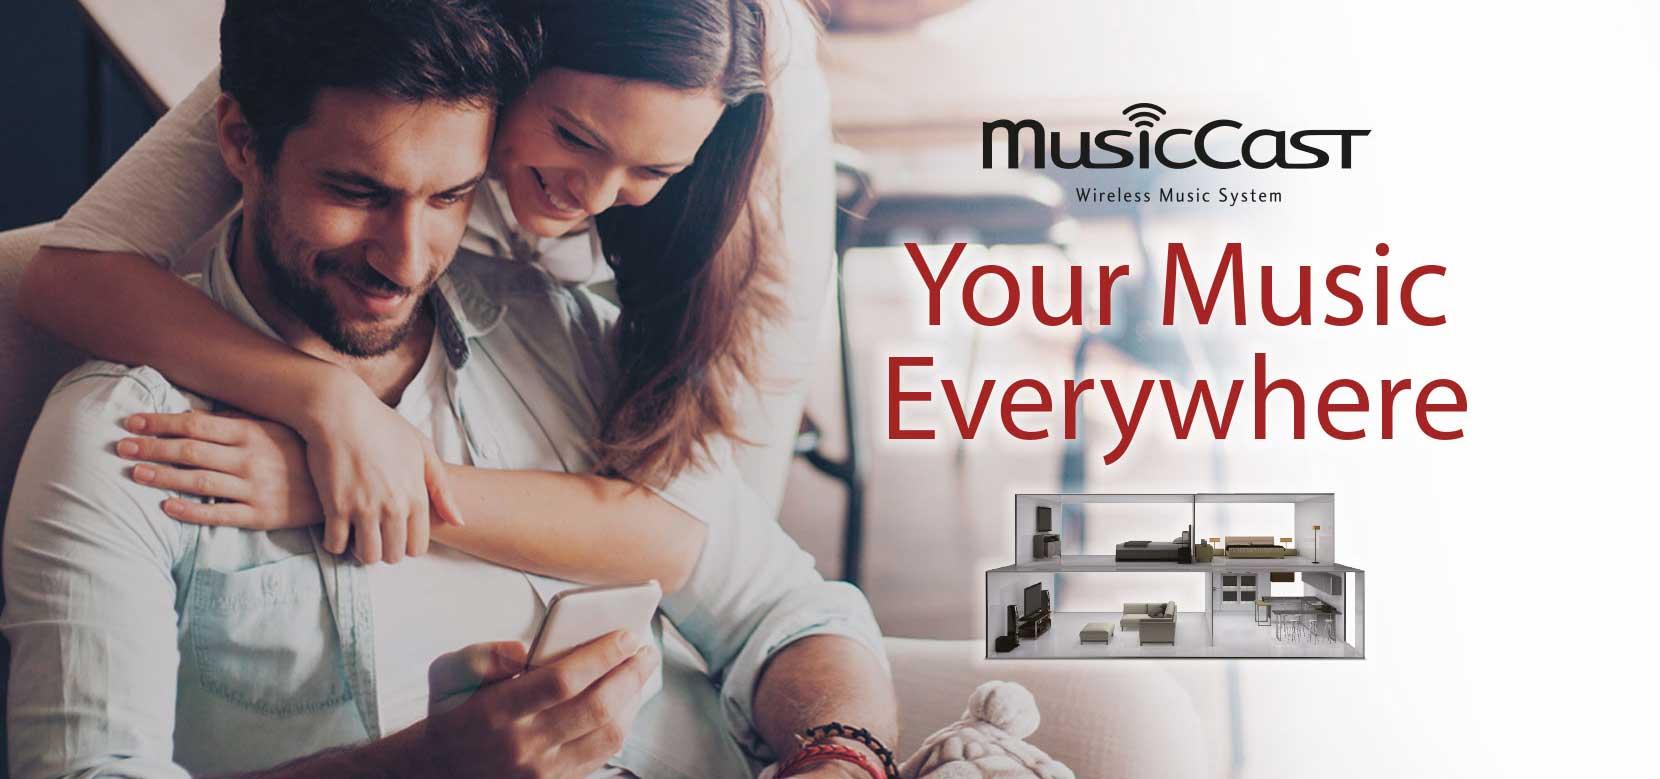 musiccast1 - Yamaha MusicCast